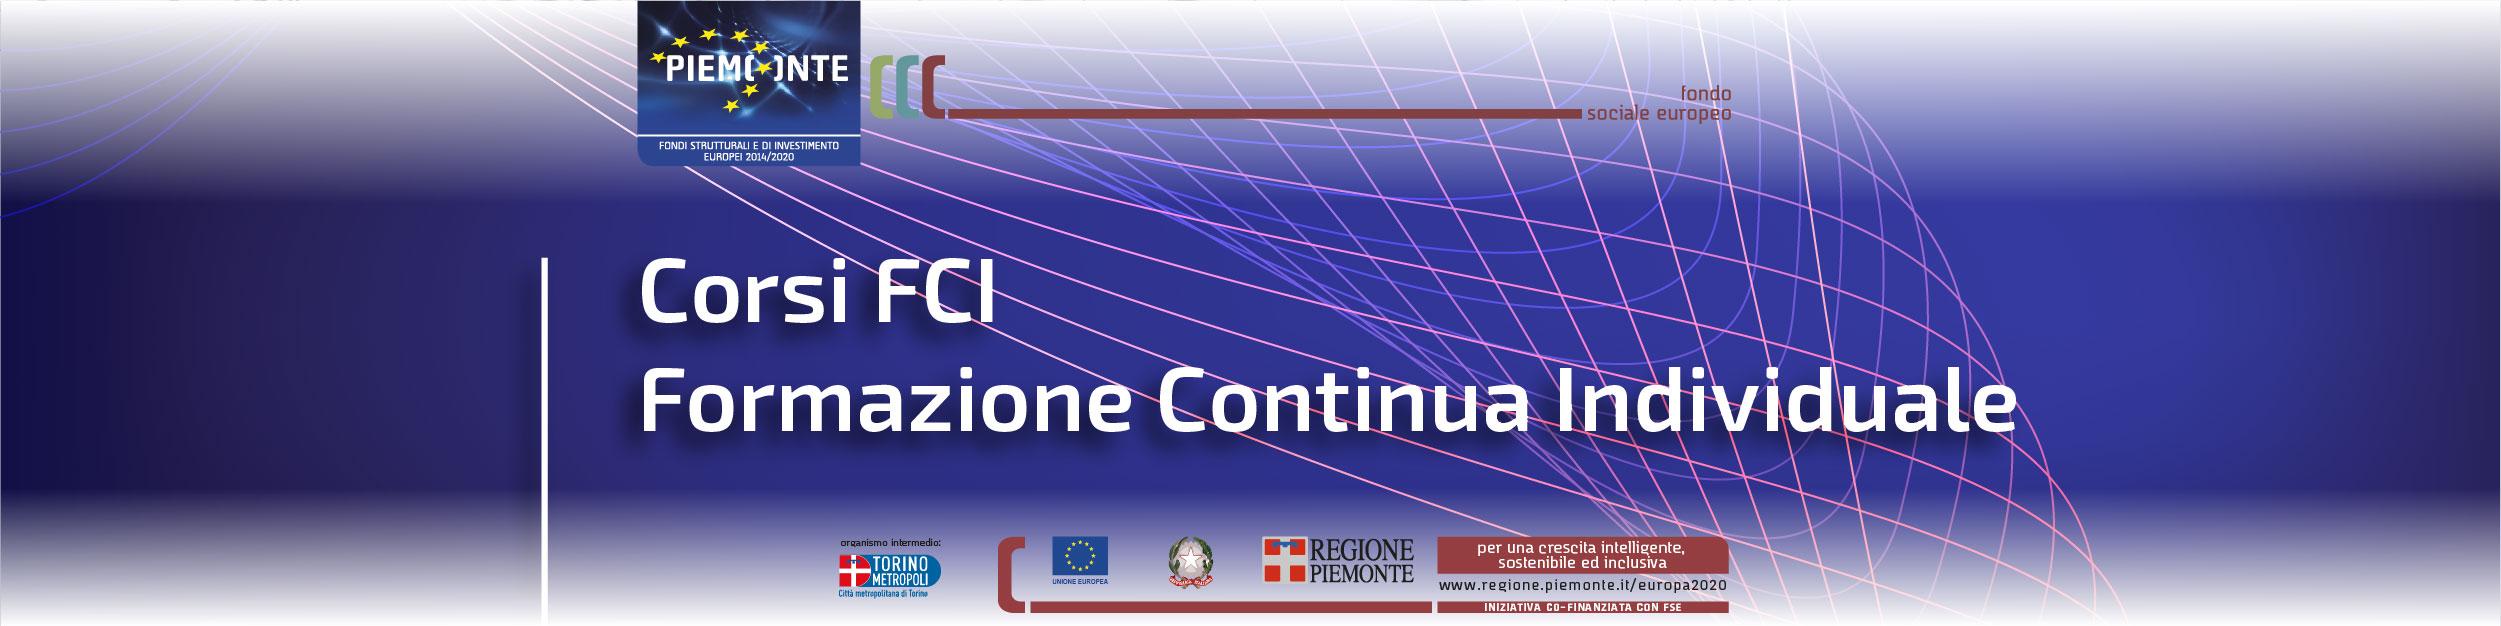 link Corsi FCI